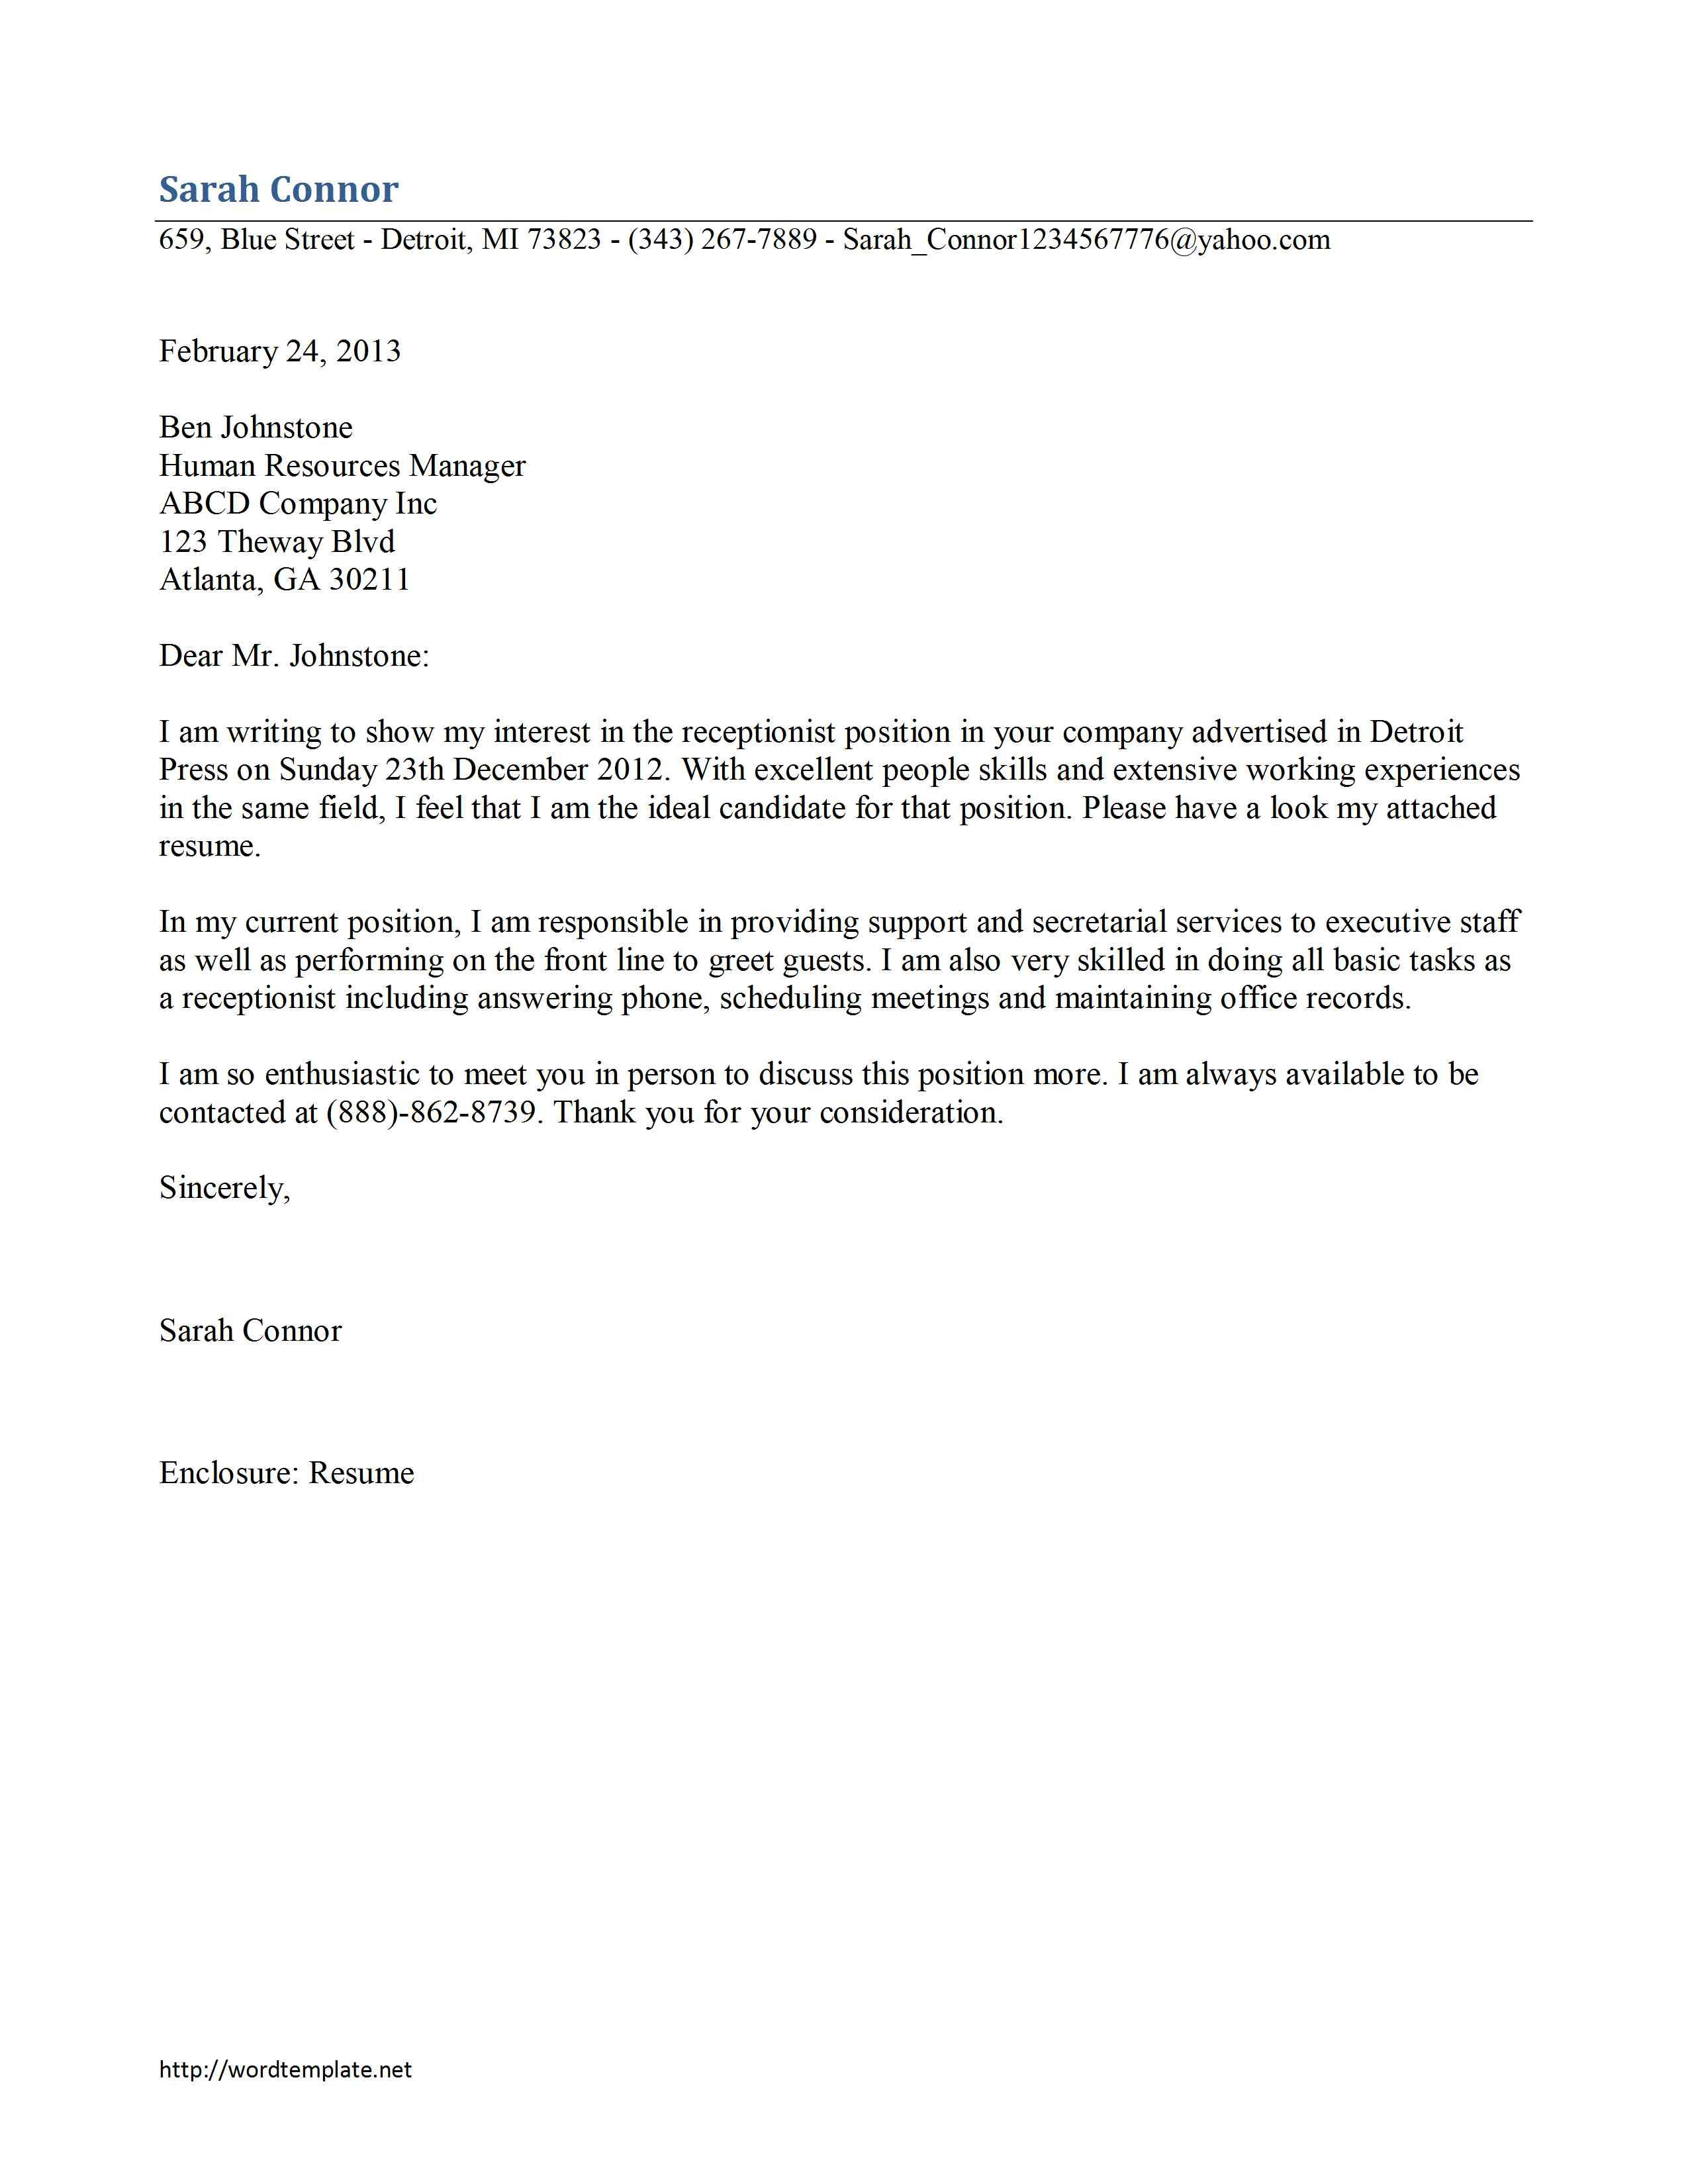 Samples Cover Letter For Receptionist Job Sample